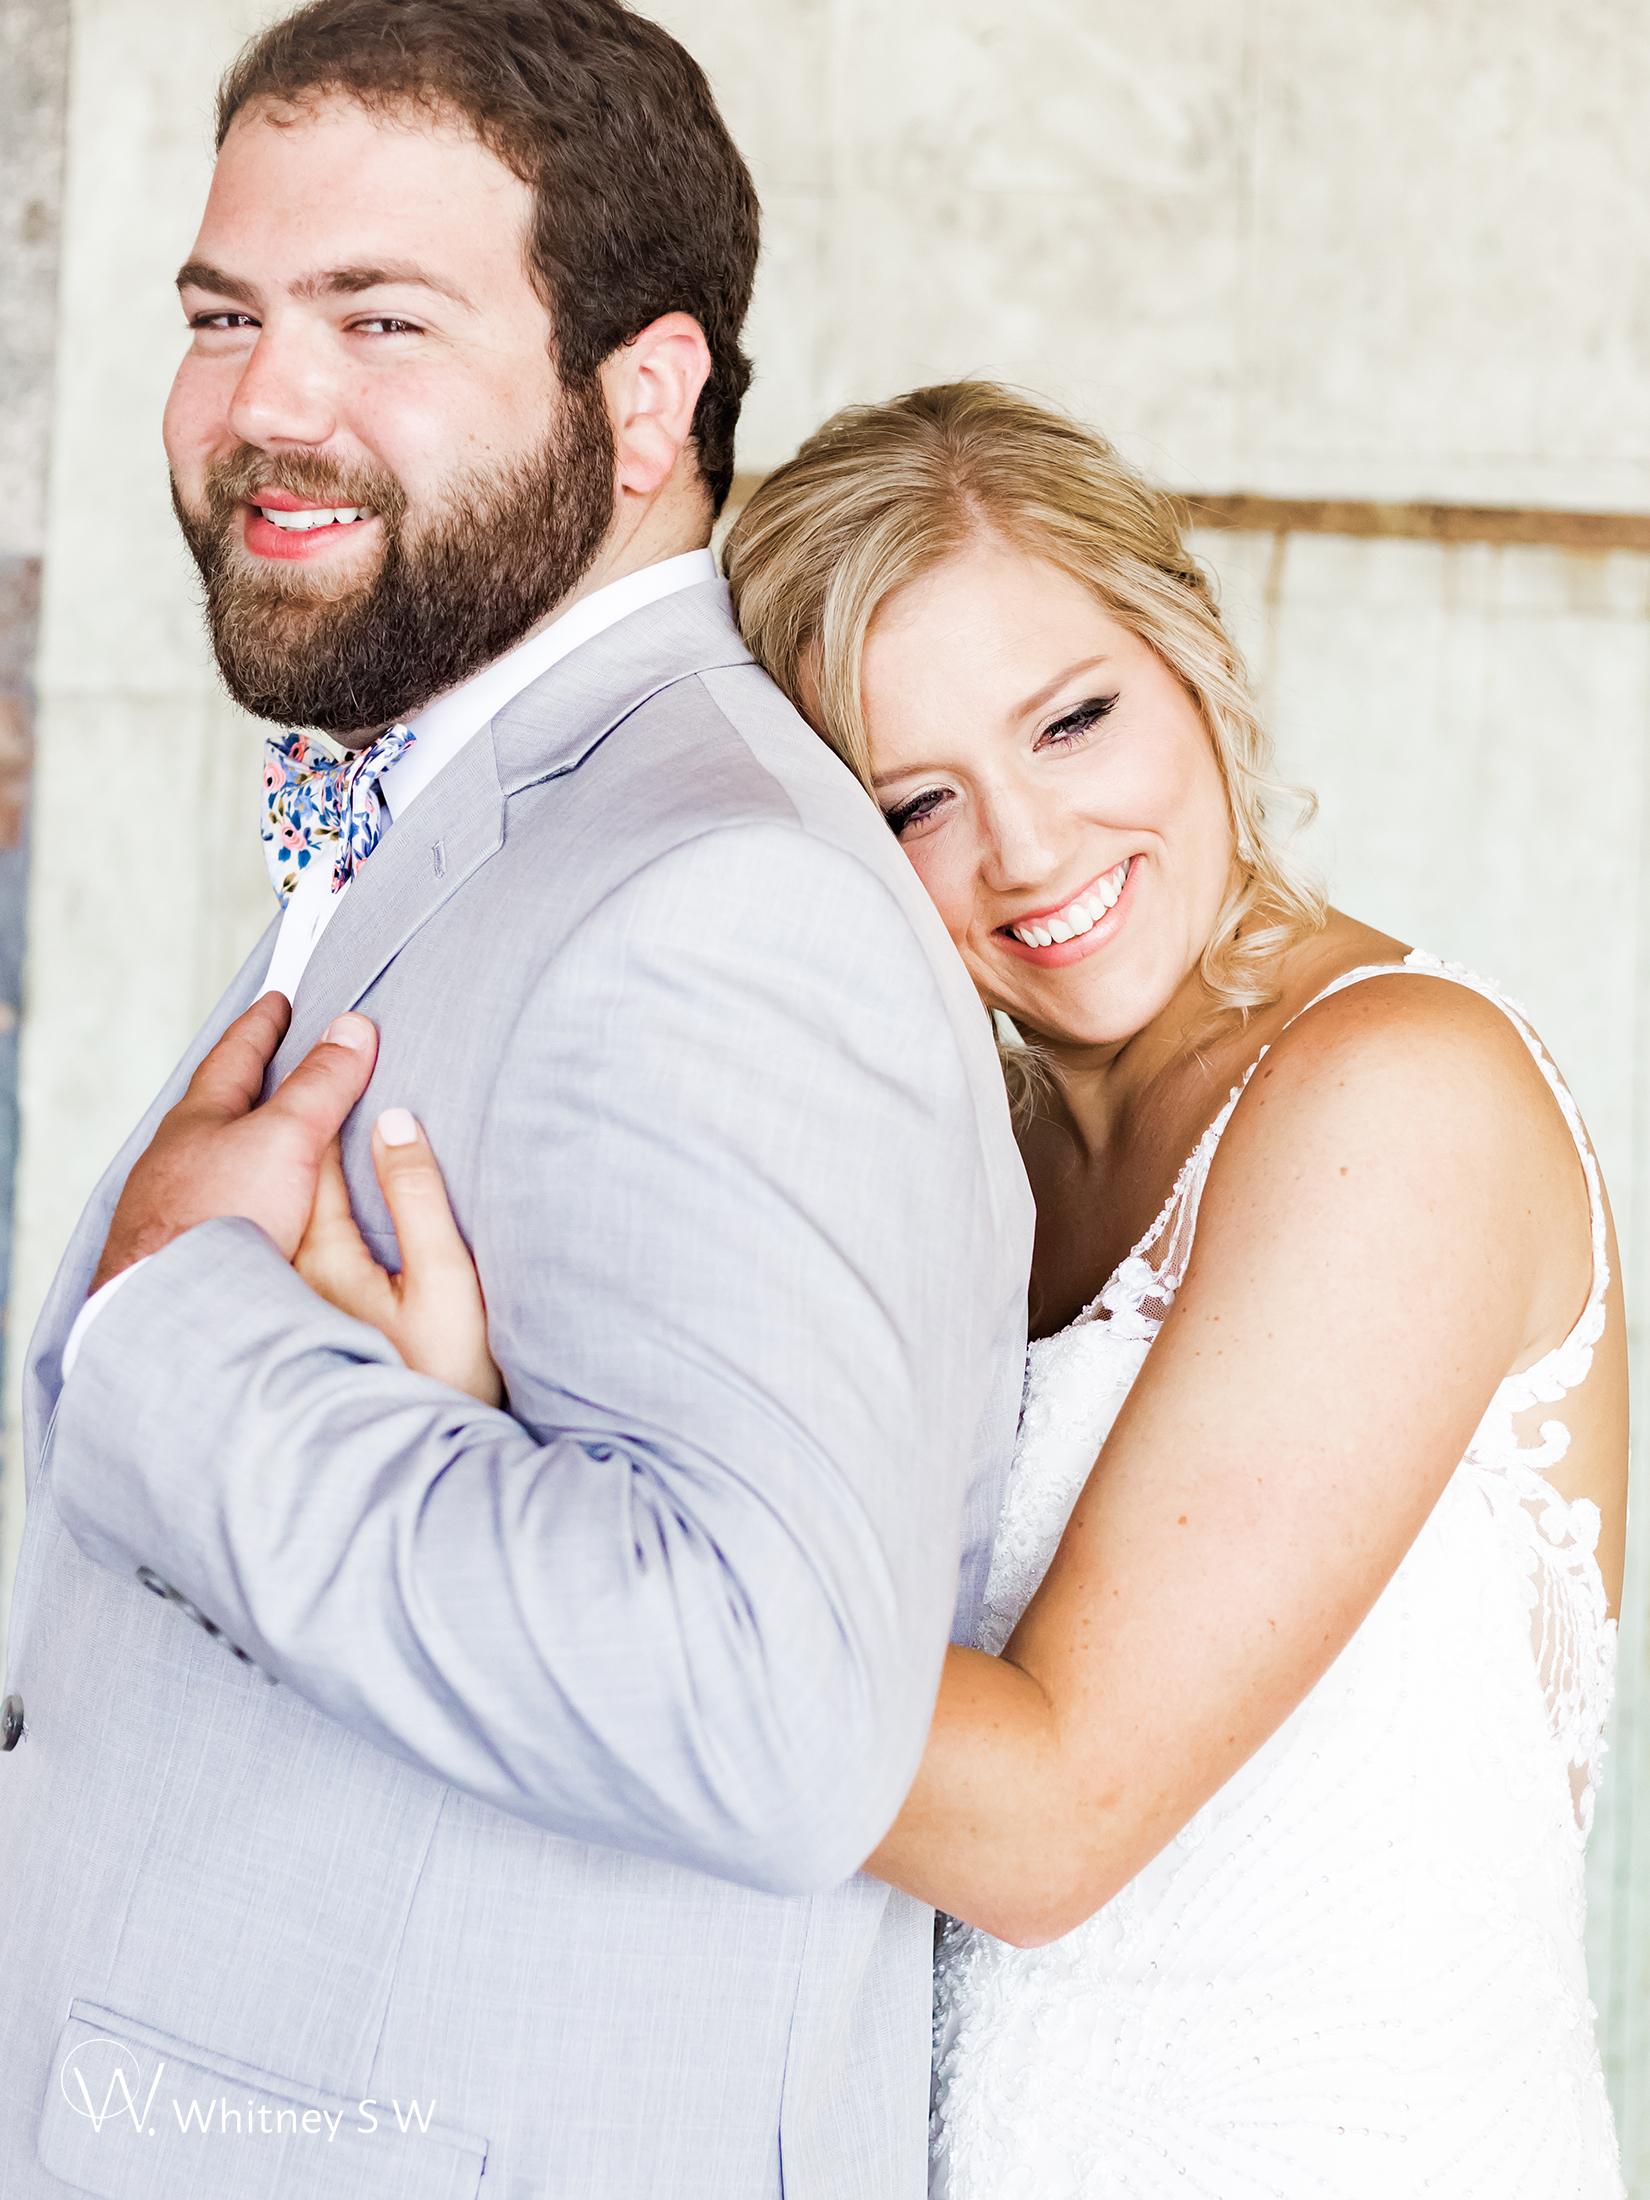 Morgan & Kaivon Wedding - Photography by Whitney S Williams whitneysw (32).jpg